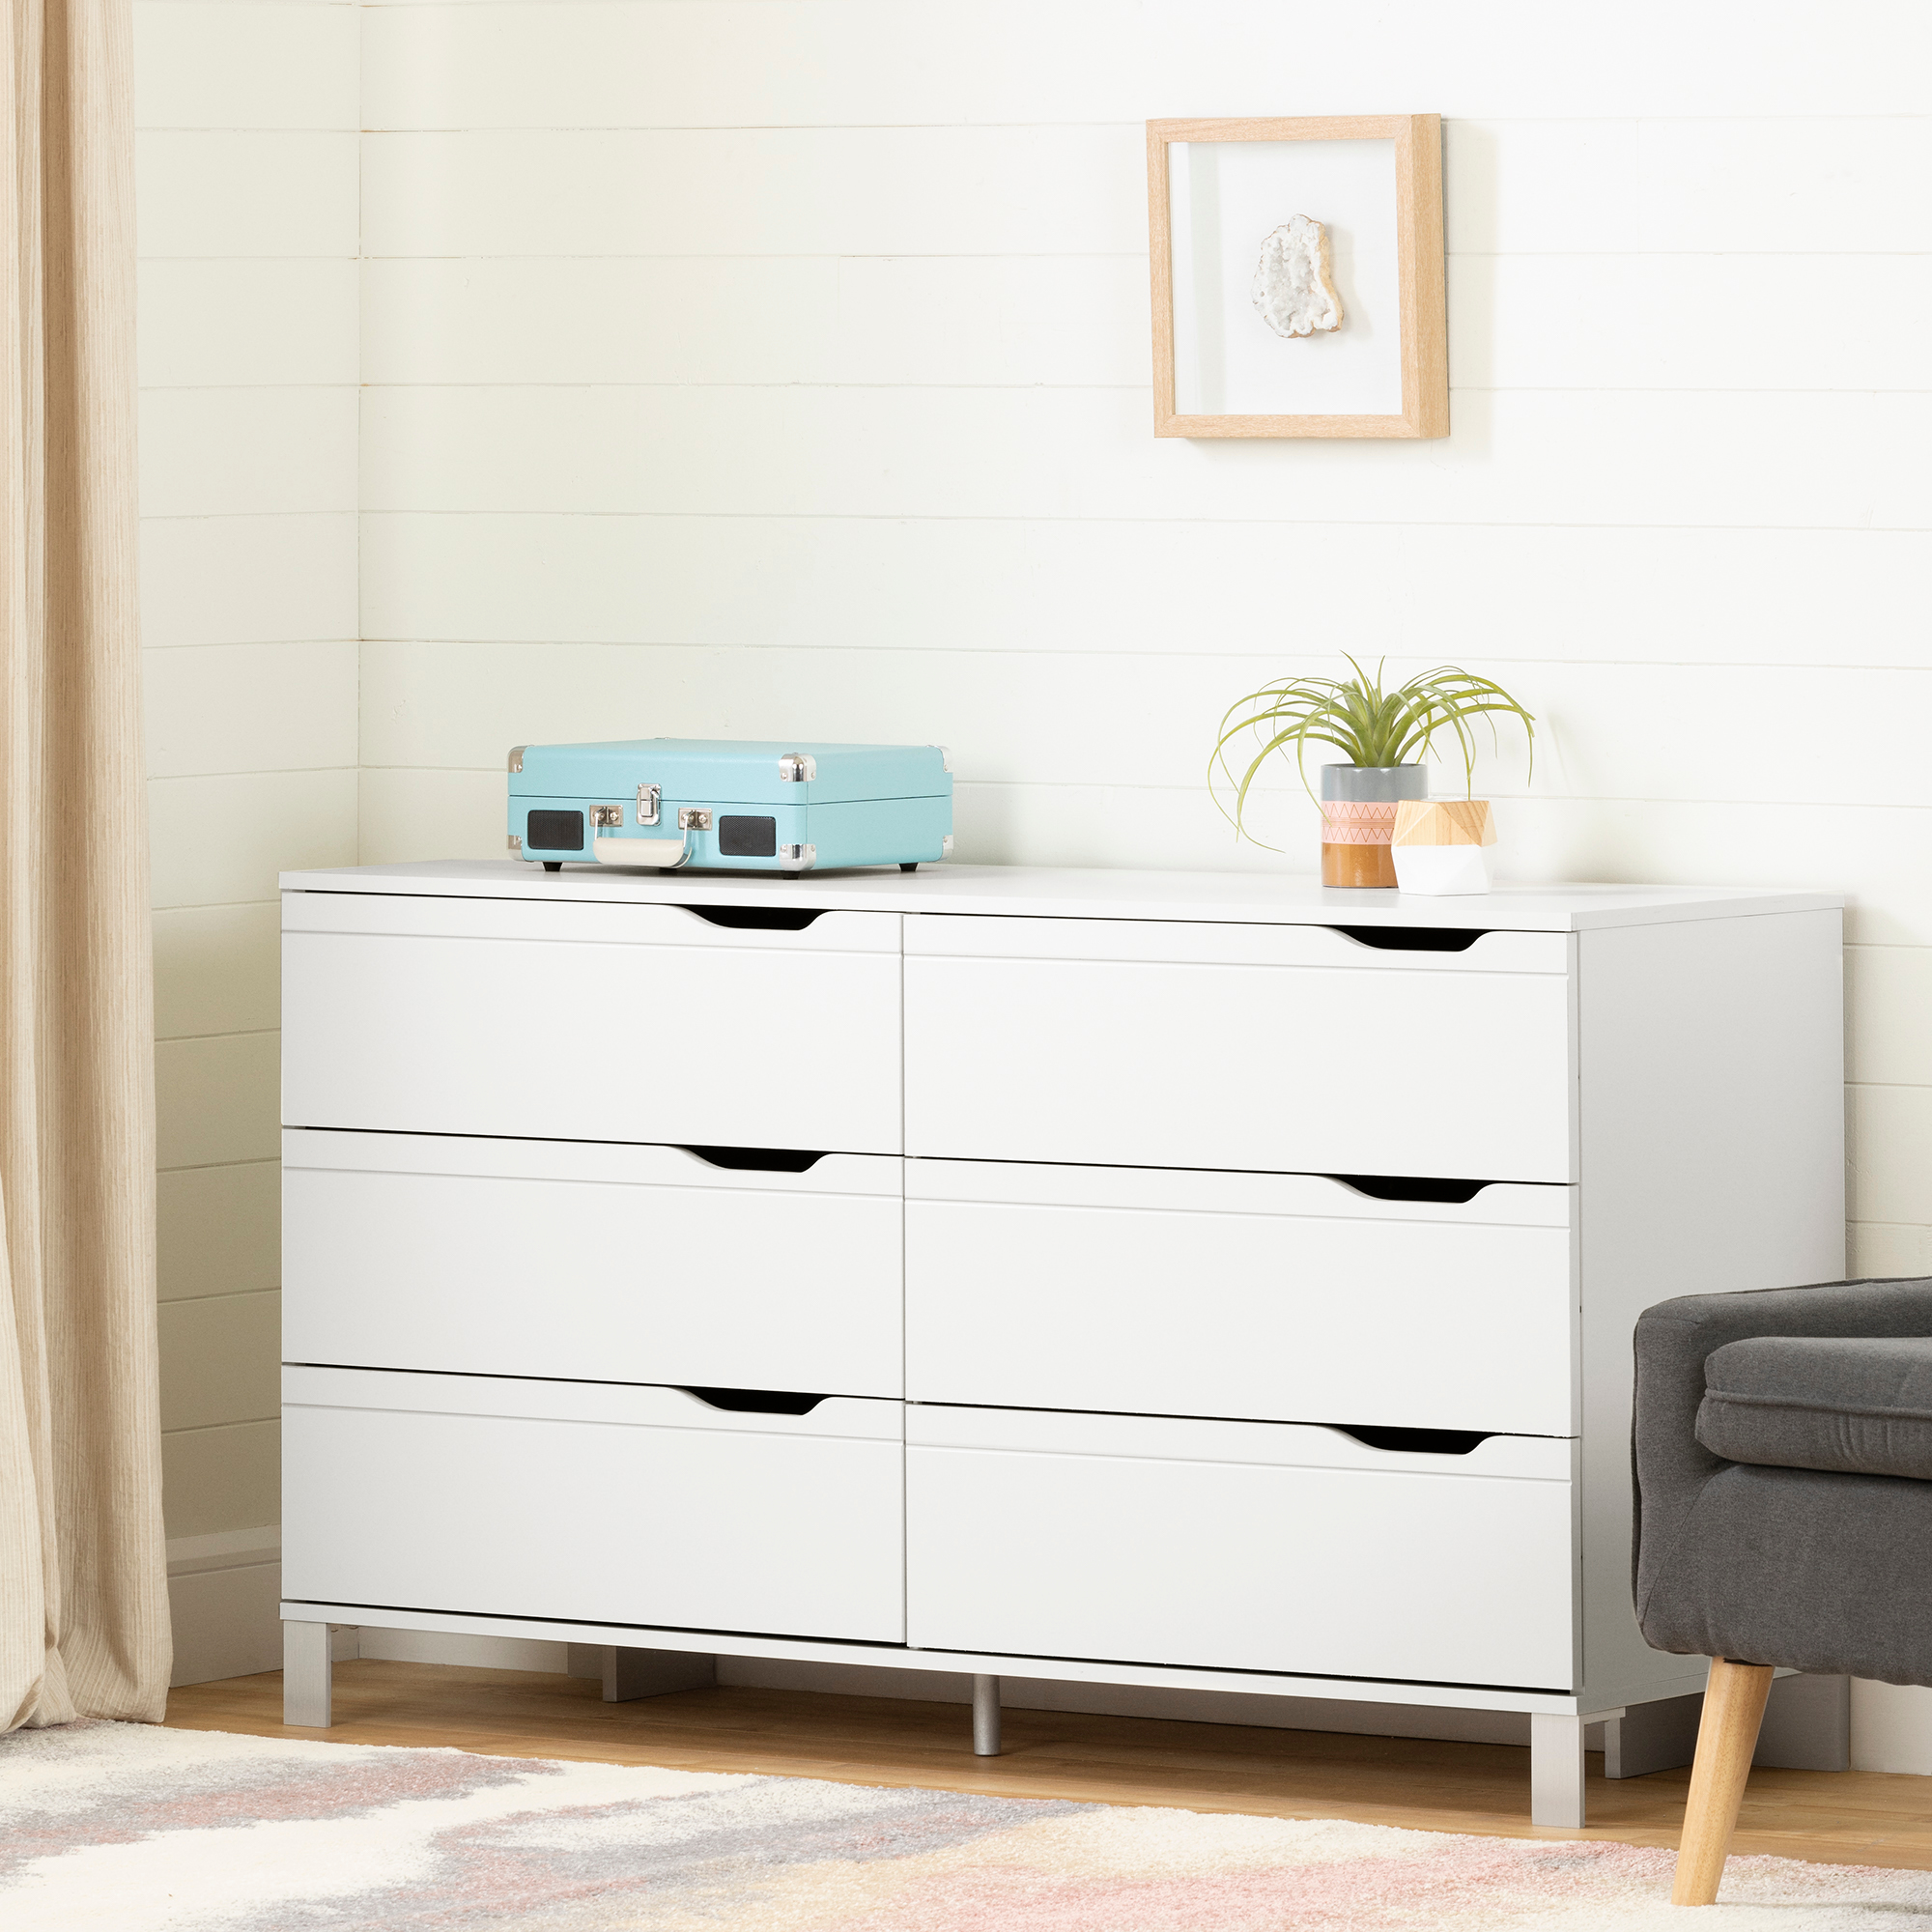 South Shore Kanagane 6-Drawer Double Dresser , White